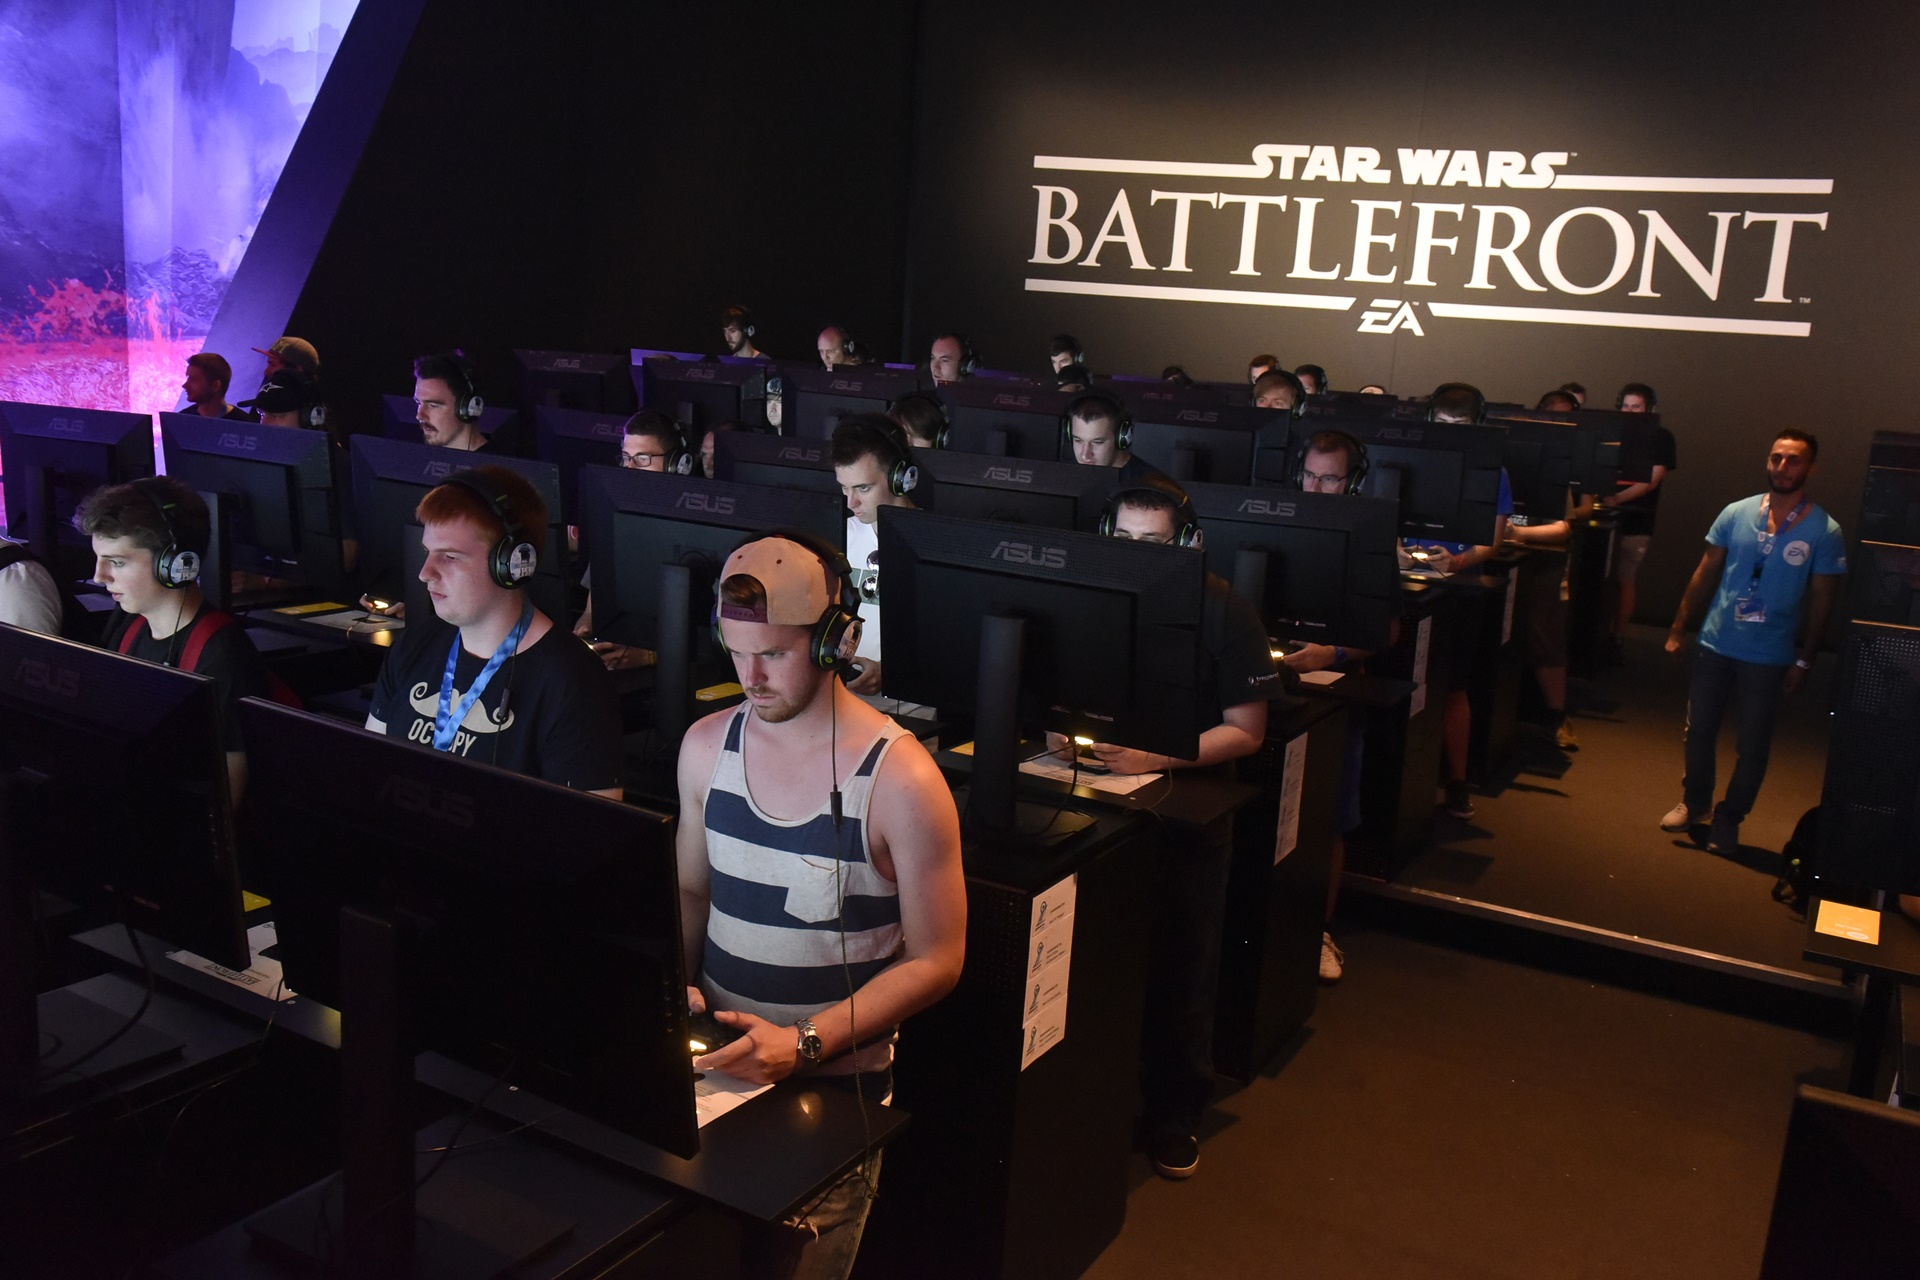 Gamescom 2015 electronic arts